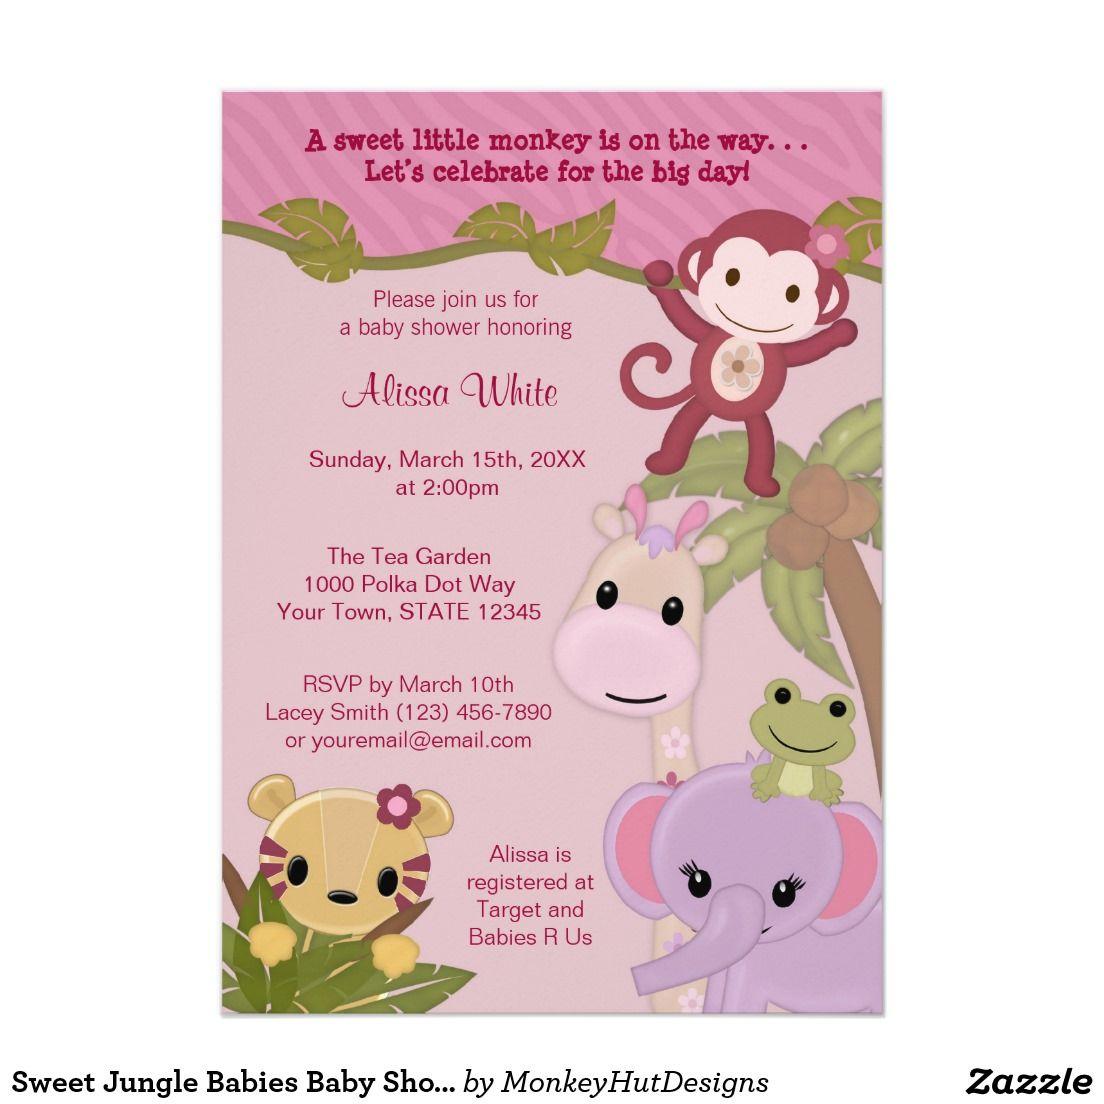 Sweet jungle babies girl baby shower invitation safari 5 x 7 shower invitations stopboris Gallery